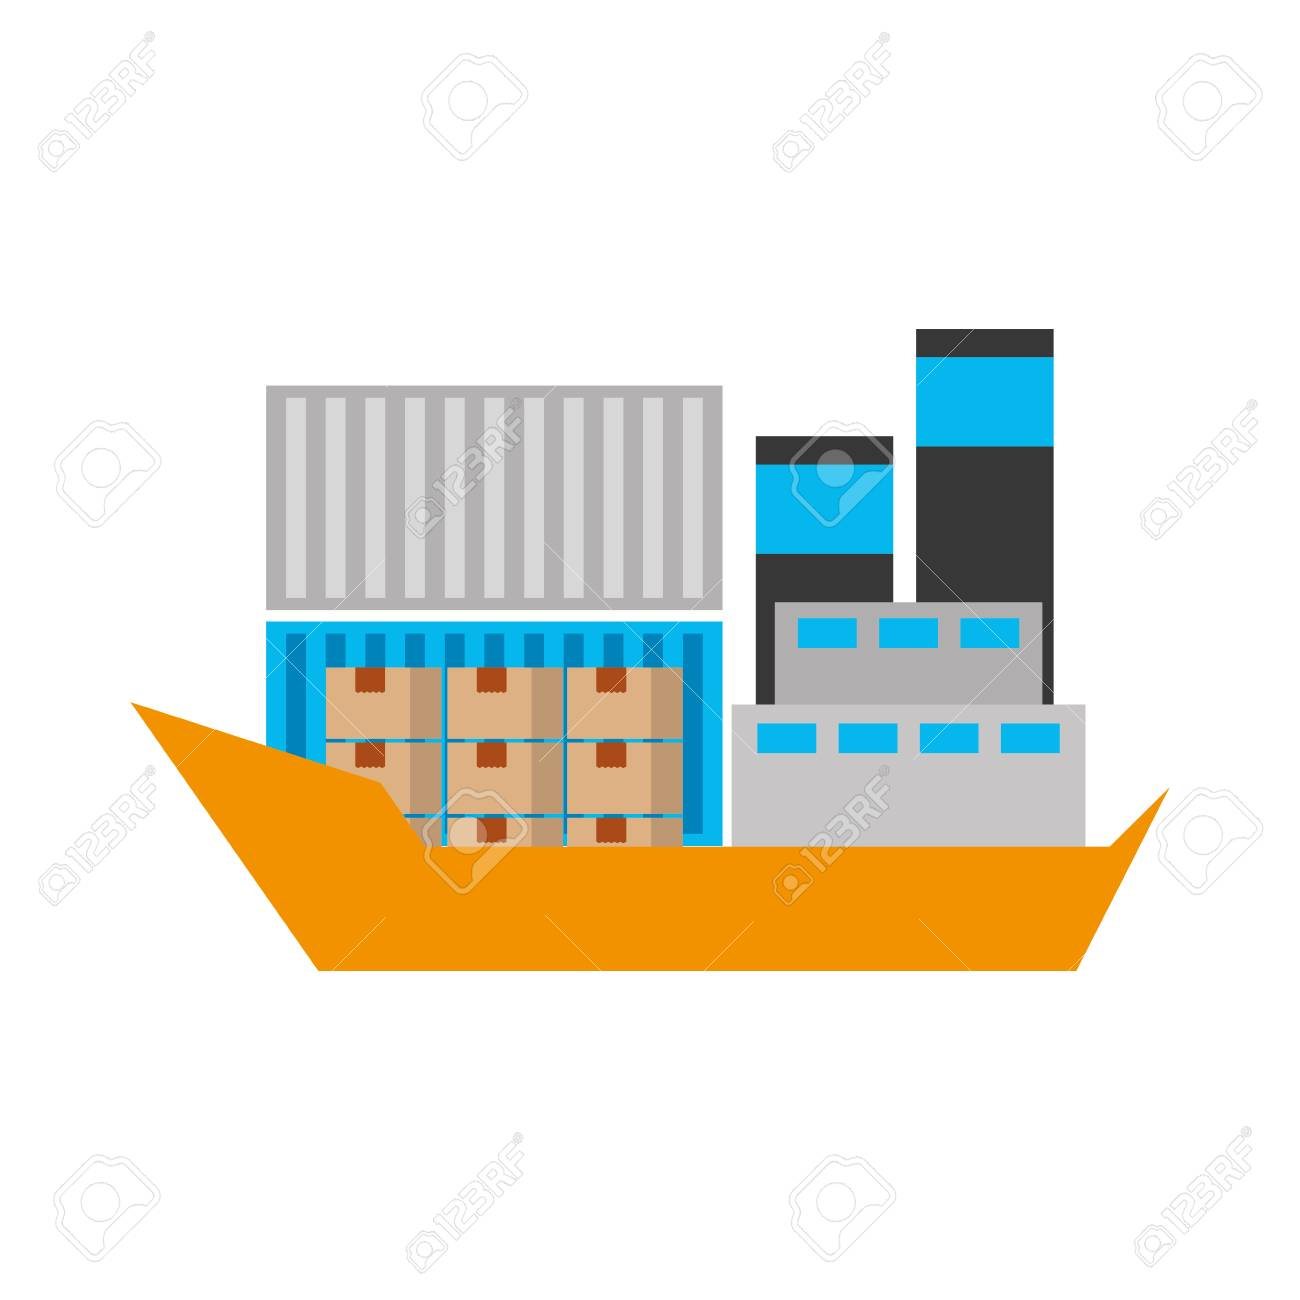 hight resolution of sea transportation logistic freight shipping cargo ship vector illustration stock vector 90305383